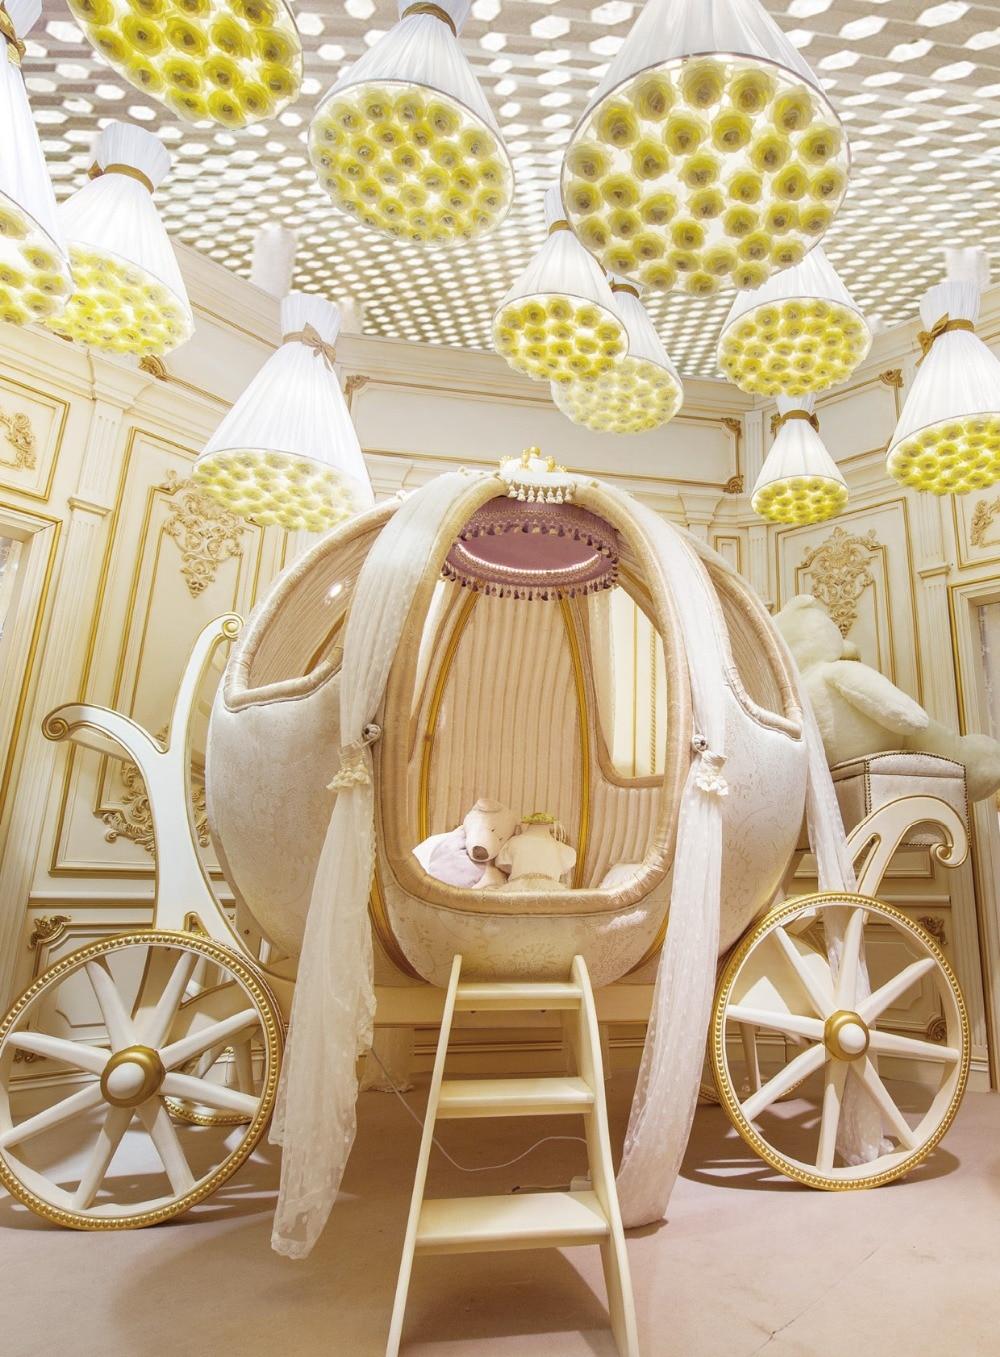 Crib for sale in pampanga - Baby Cribs Germany Aliexpress Com Buy European Luxury Fairy Tale Style Pumpkin Shape Crib Kids